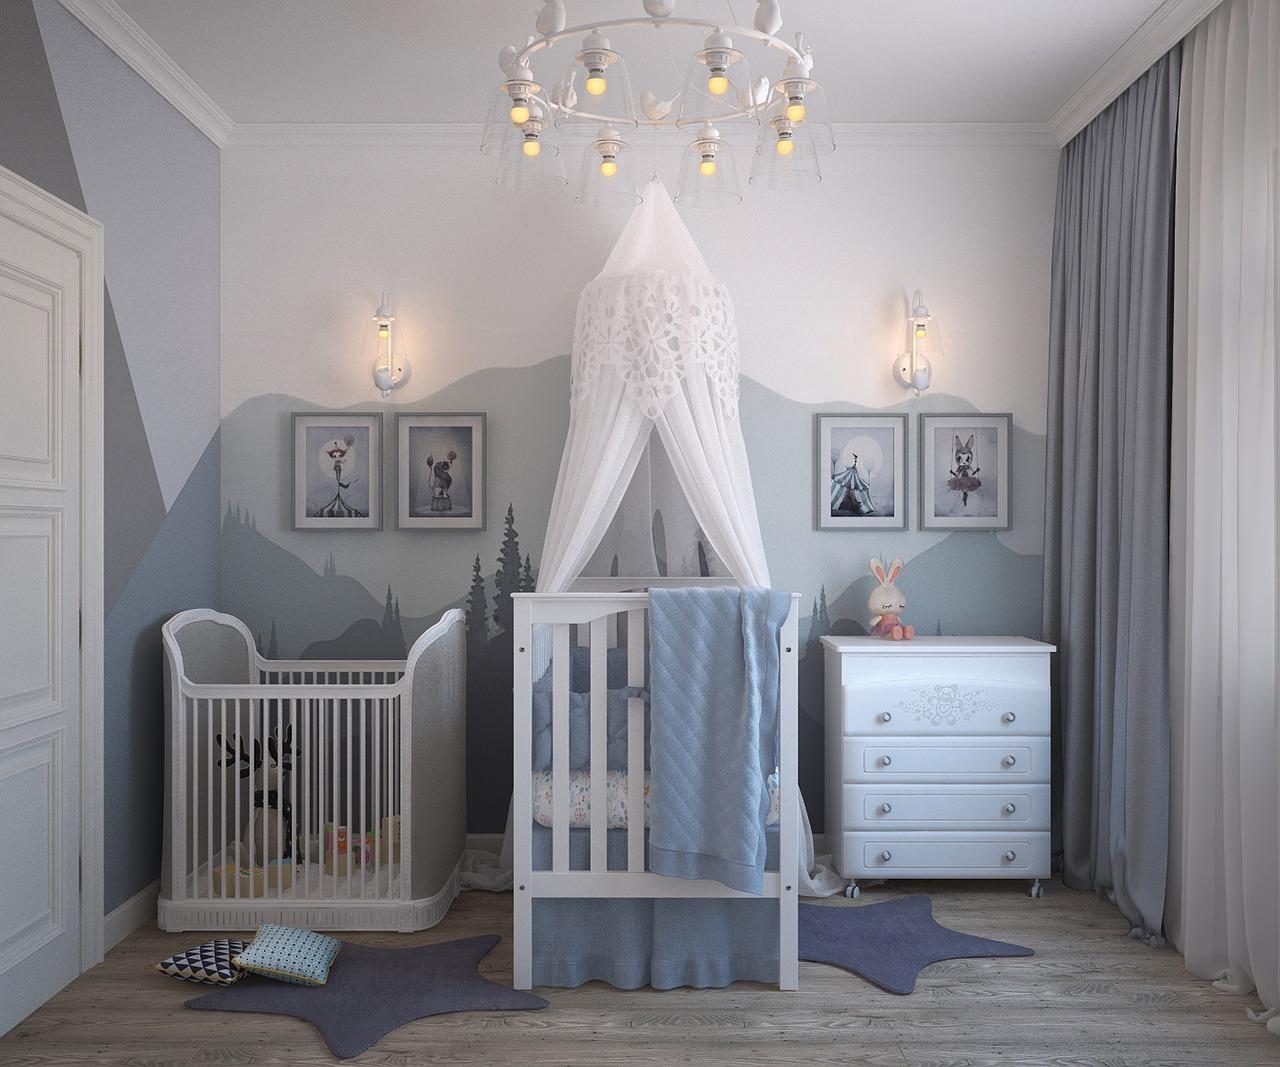 Krevetac i ogradica za igranje u sobi za bebe